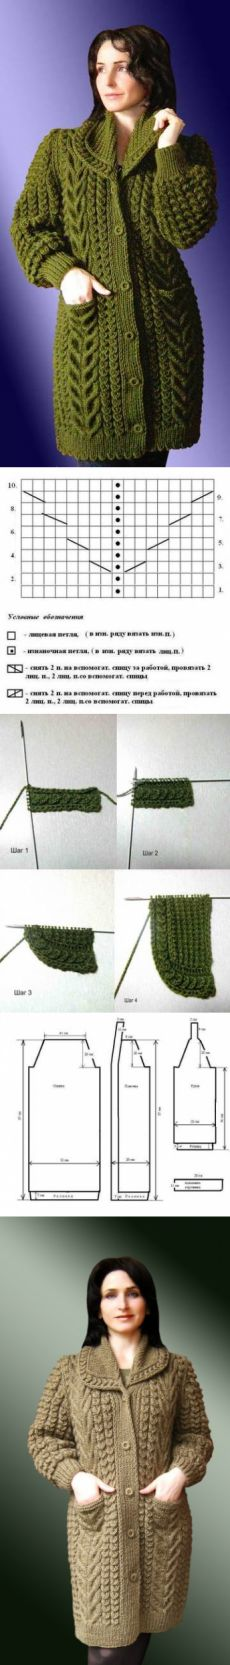 Mejores 33 imágenes de Fruta de ganchillo en Pinterest | Crochet ...